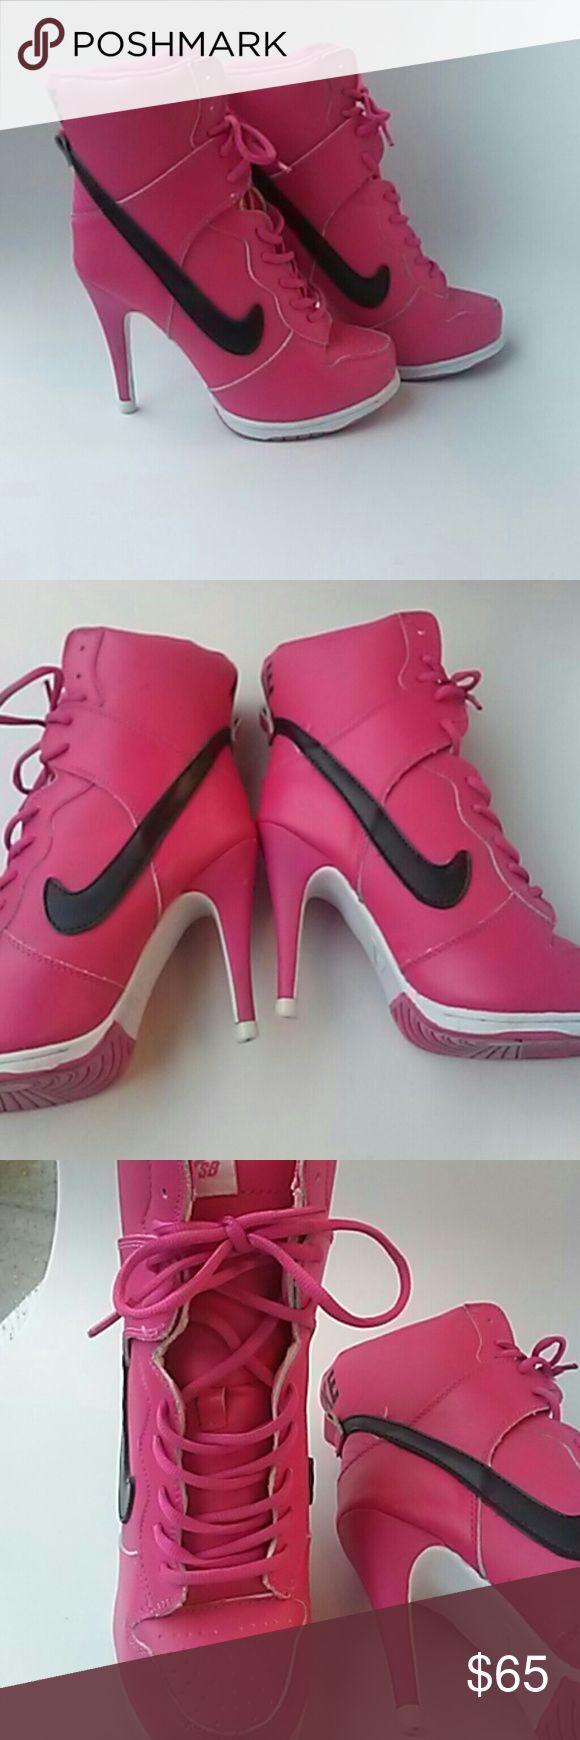 Nike high heel shoes Pink size 7 nike high heel shoes lightly uesed Nike Shoes Heels